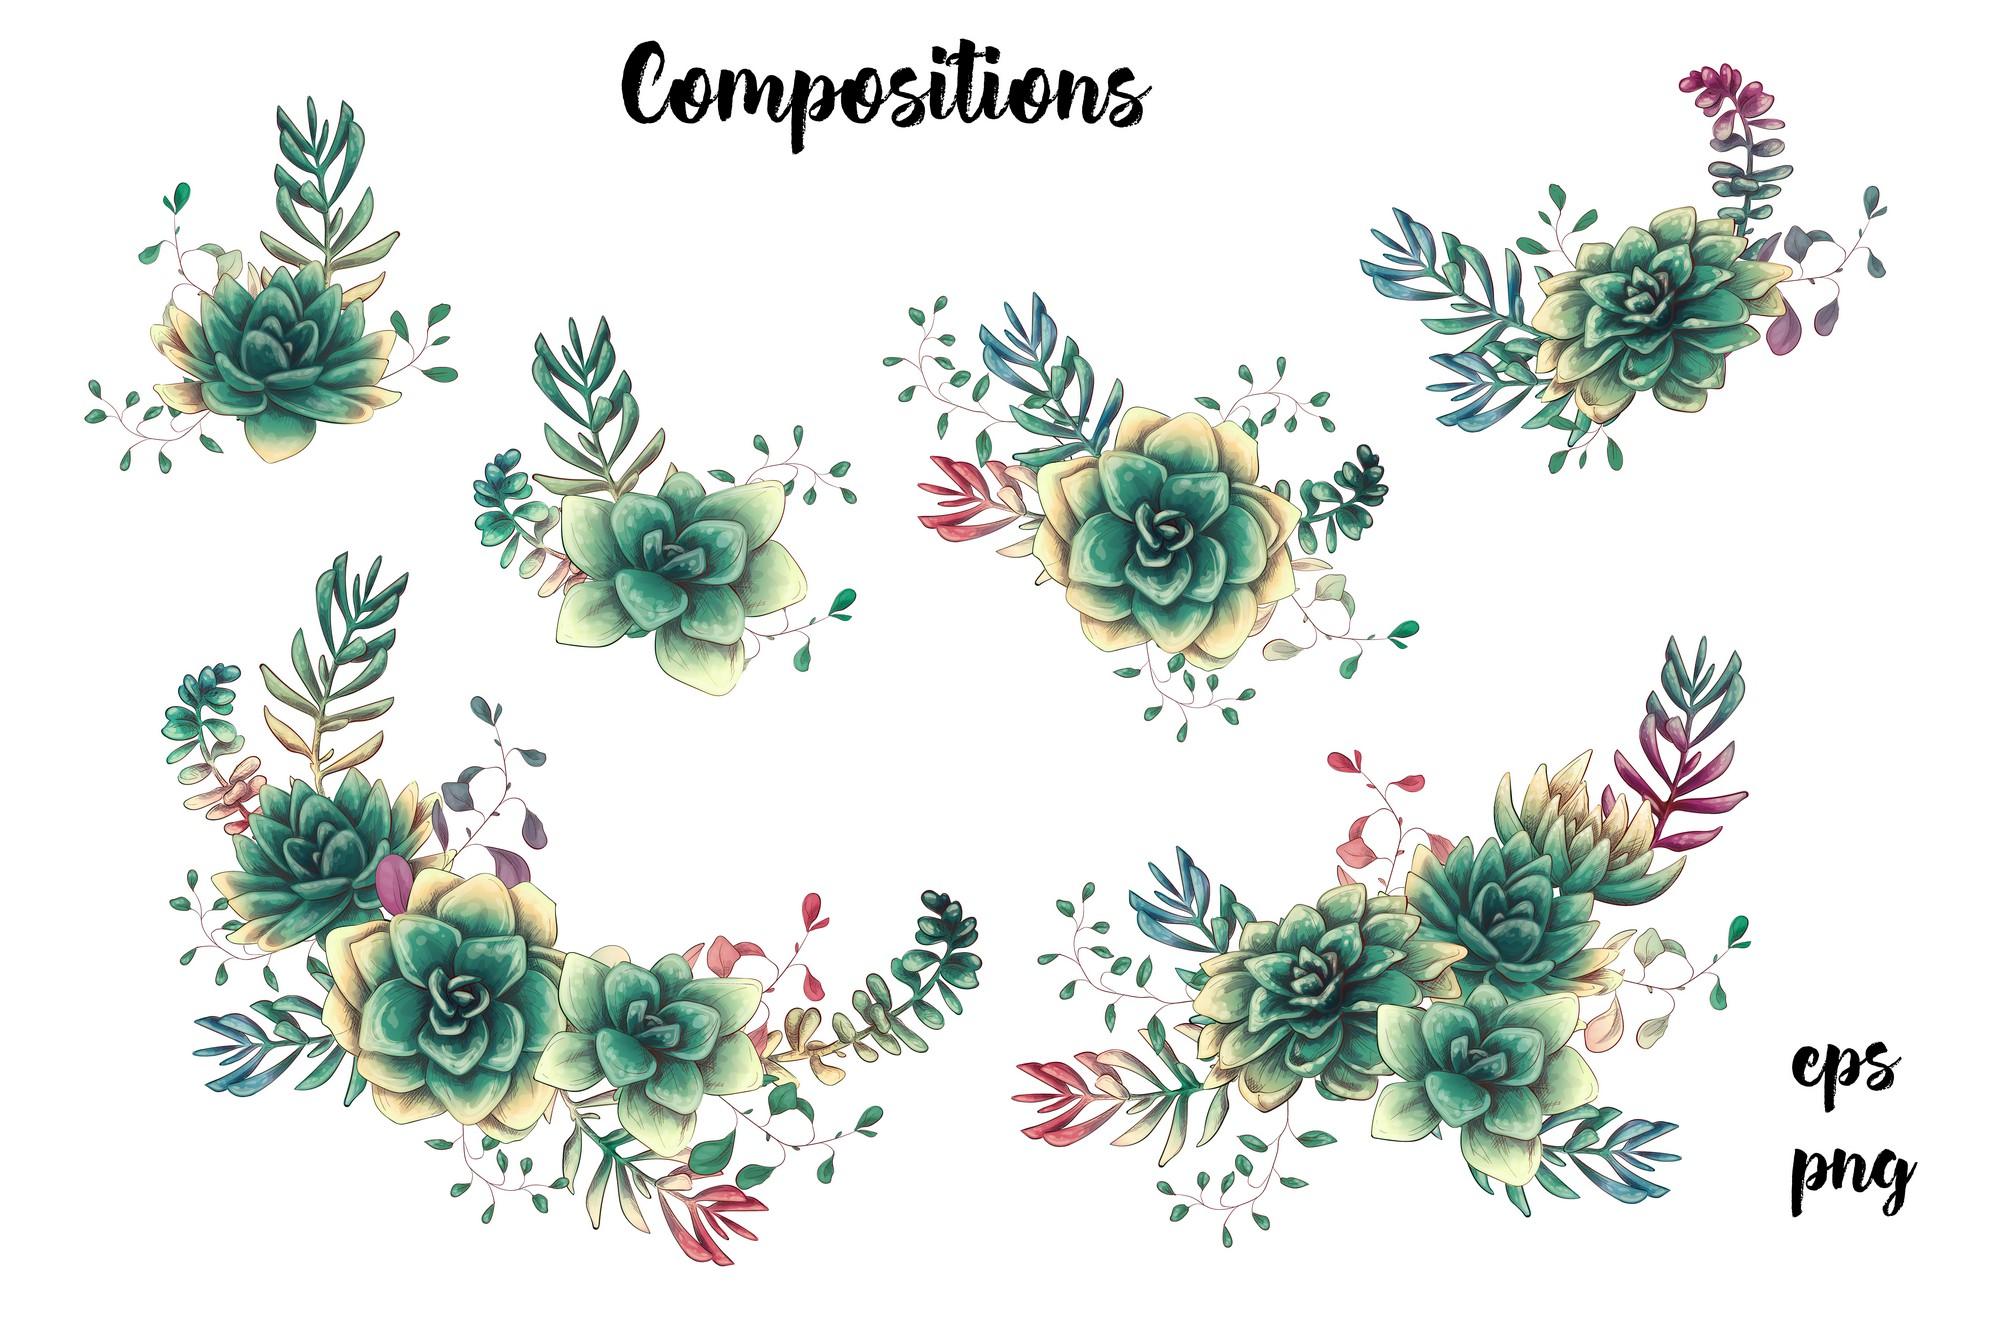 Cute Cactus Clipart: Cacti & Succulents Vectors - Image00005 1